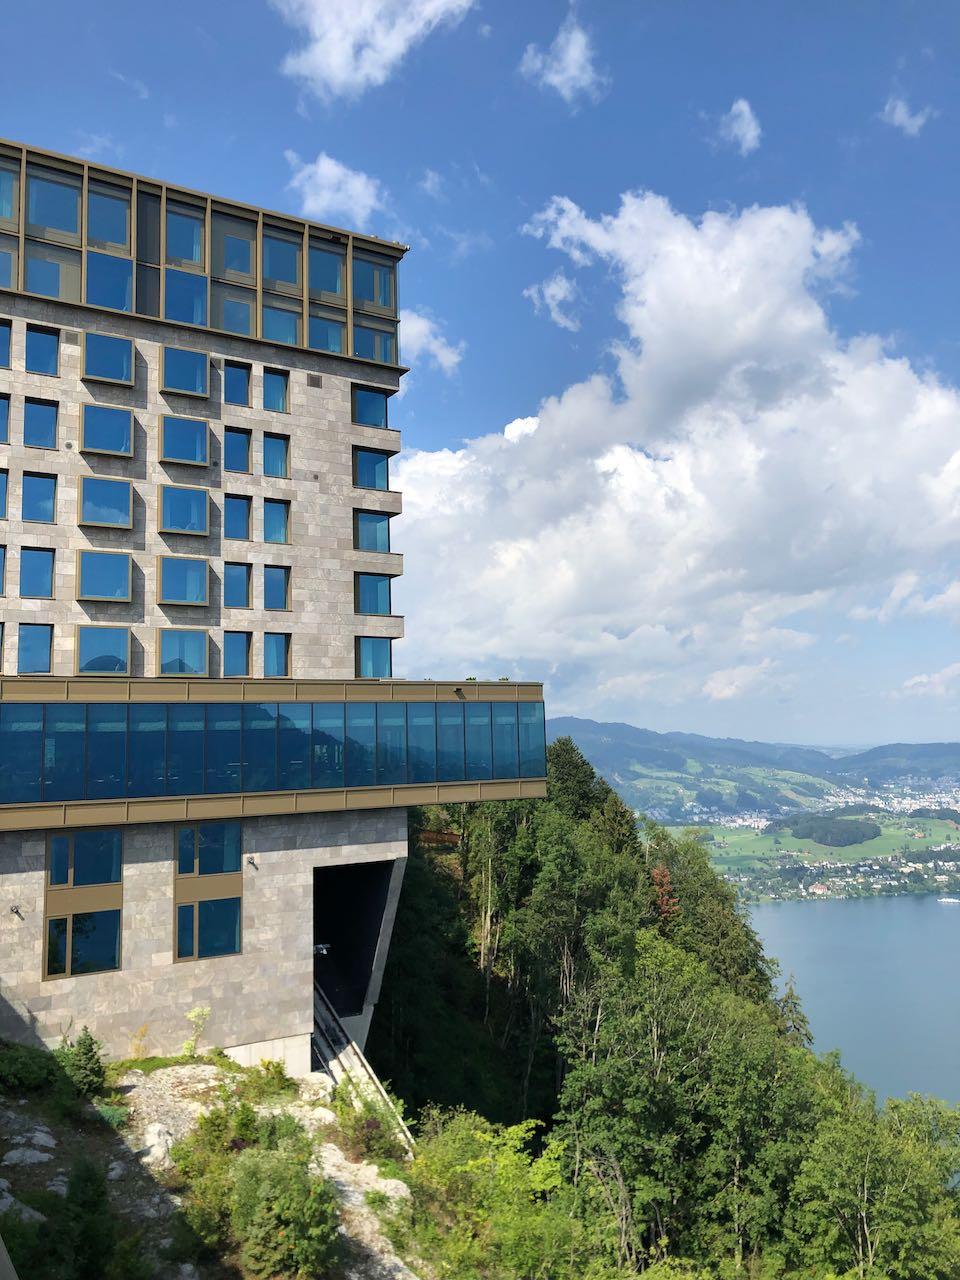 Burgenstock Resort above Lucerne Switzerland is my Favorite Resort in the World